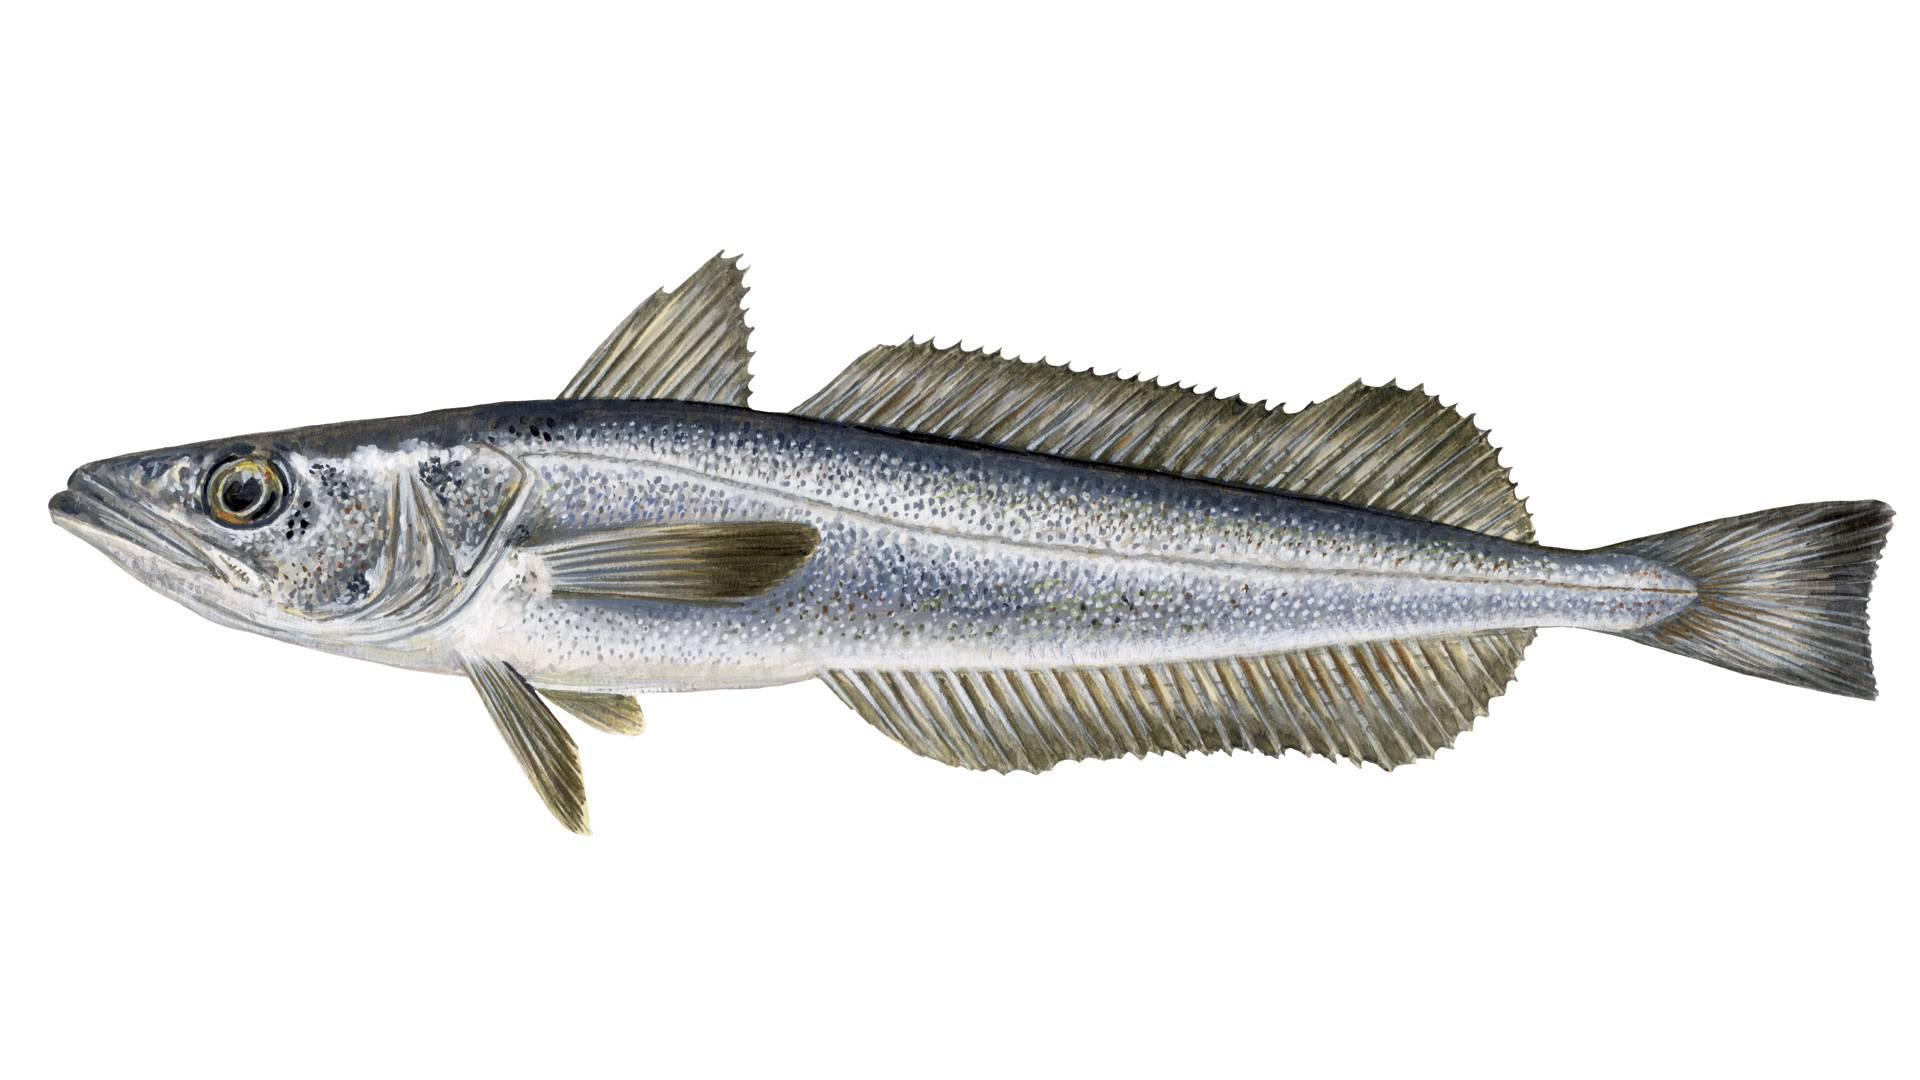 Illustration of Merluccius capensis - Shallow Water Cape Hake